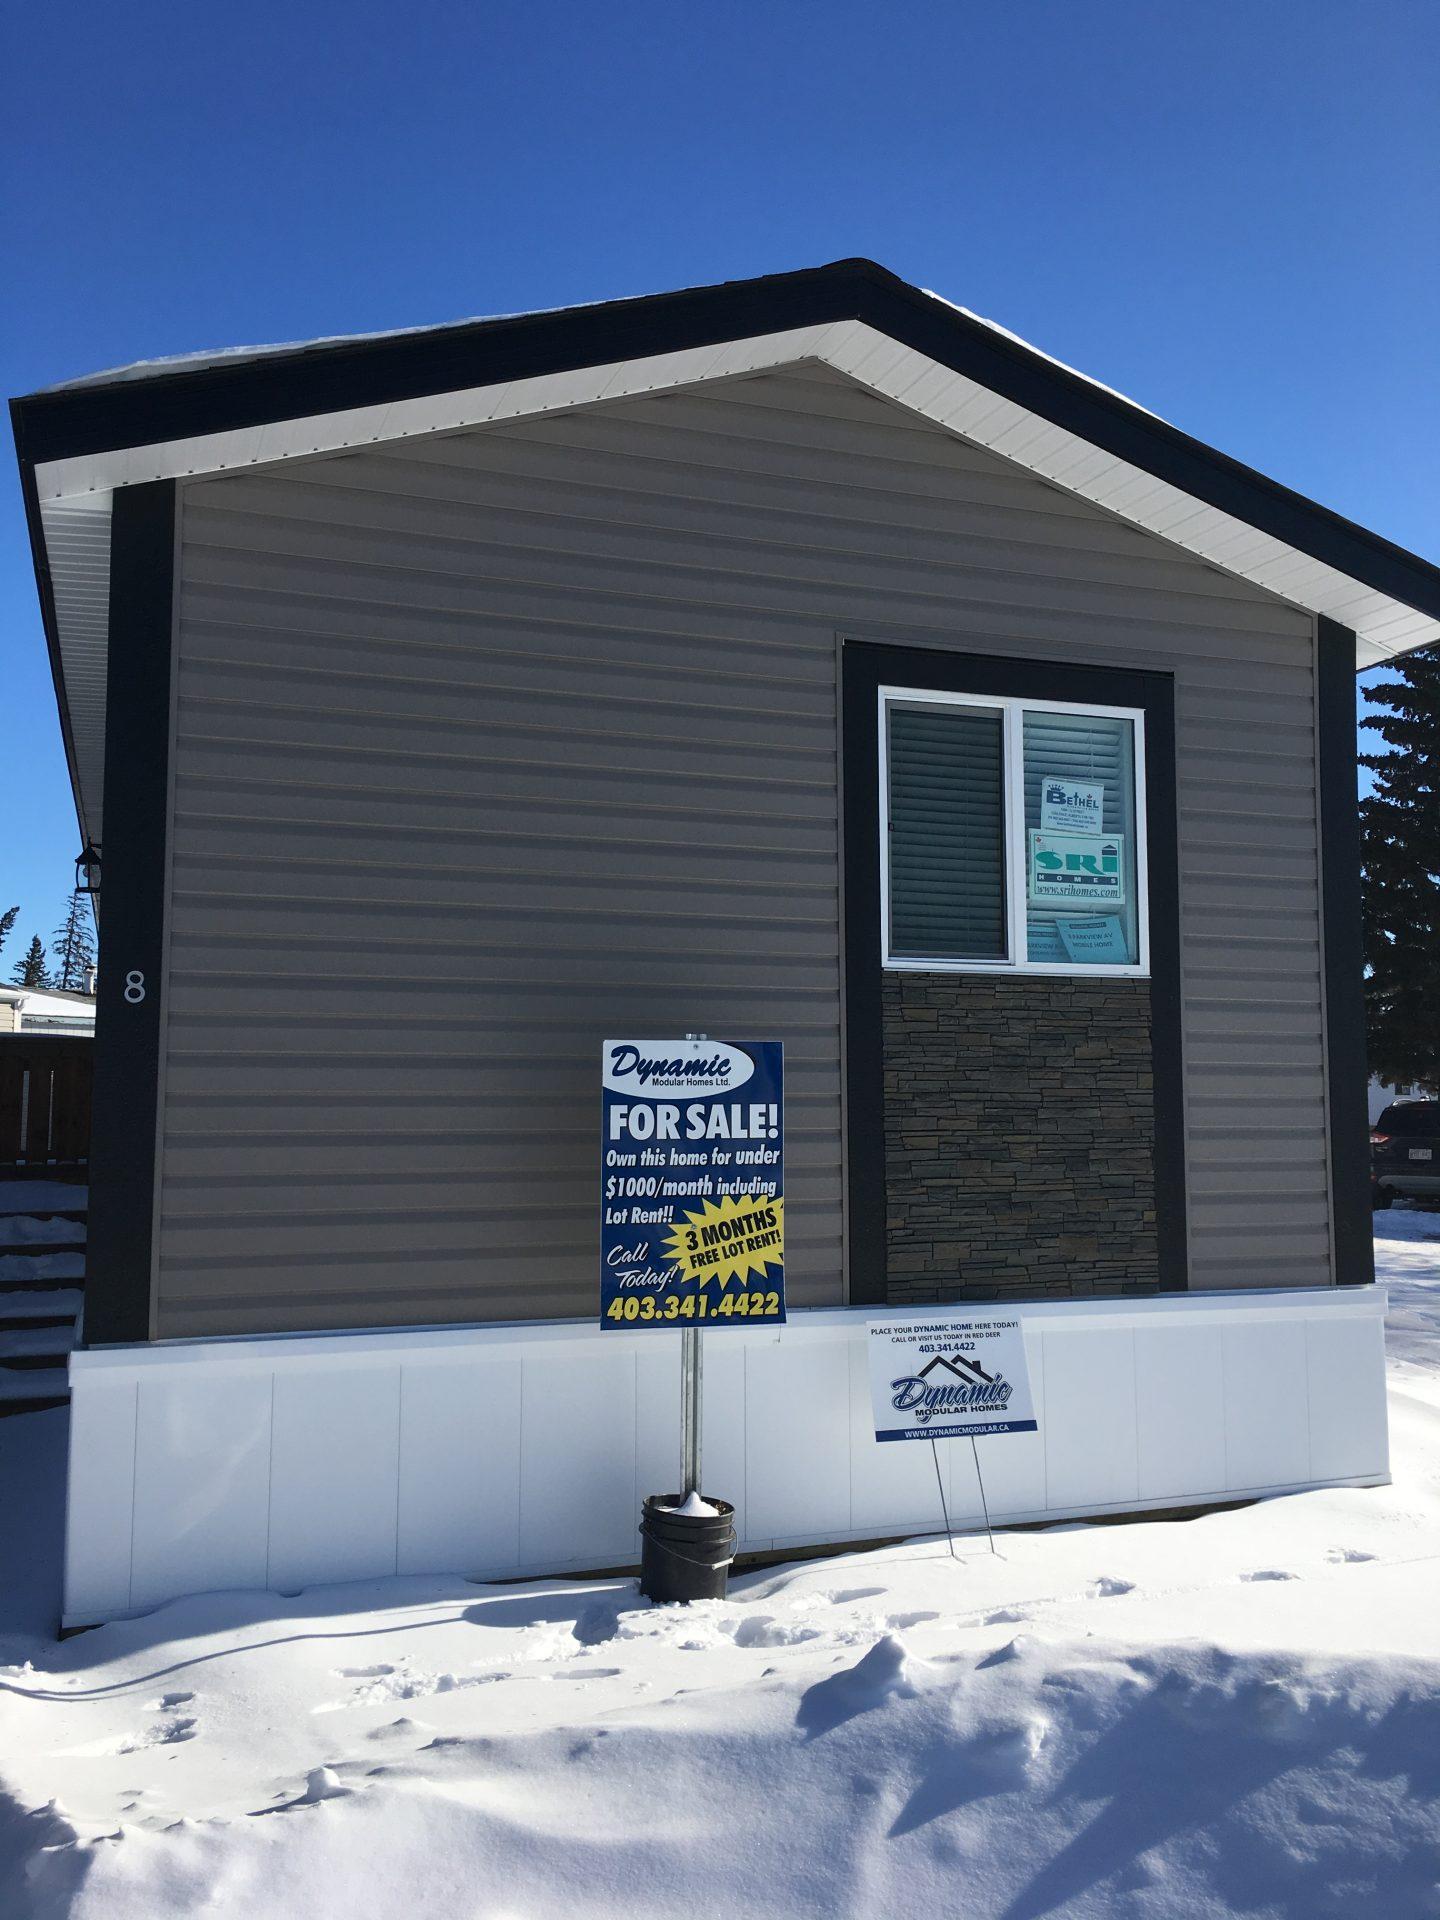 Dynamic Modular Homes - modular homes on